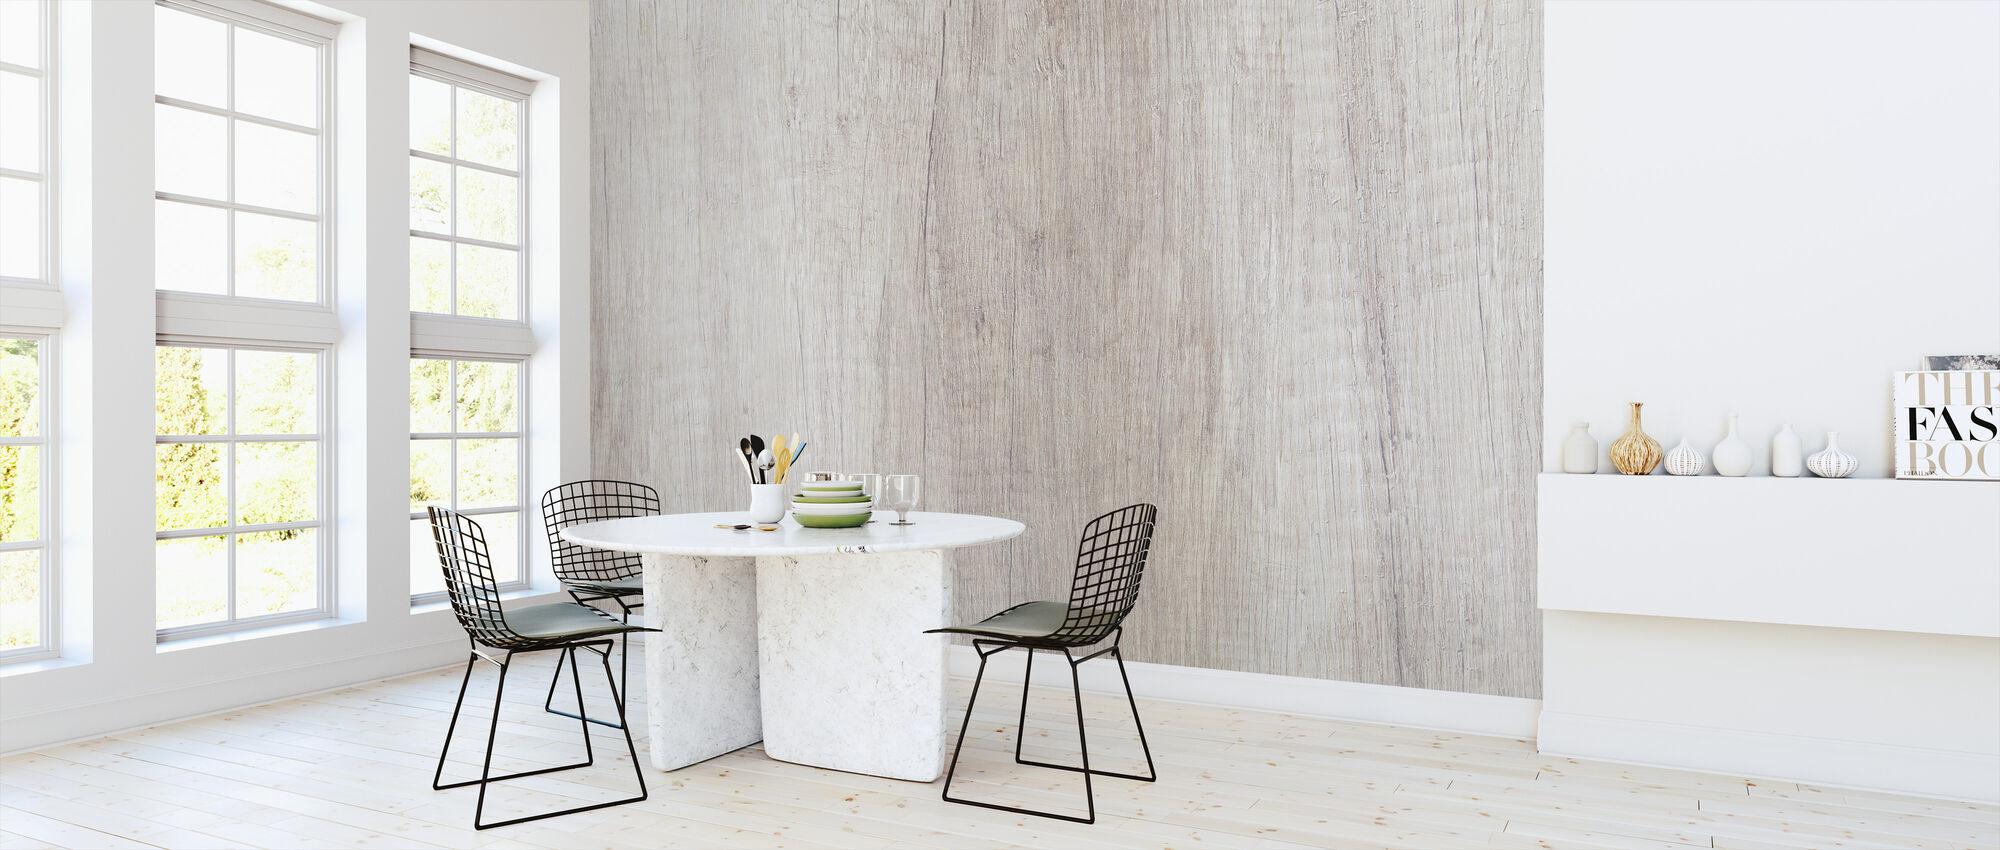 Rustic Wood - Wallpaper - Kitchen